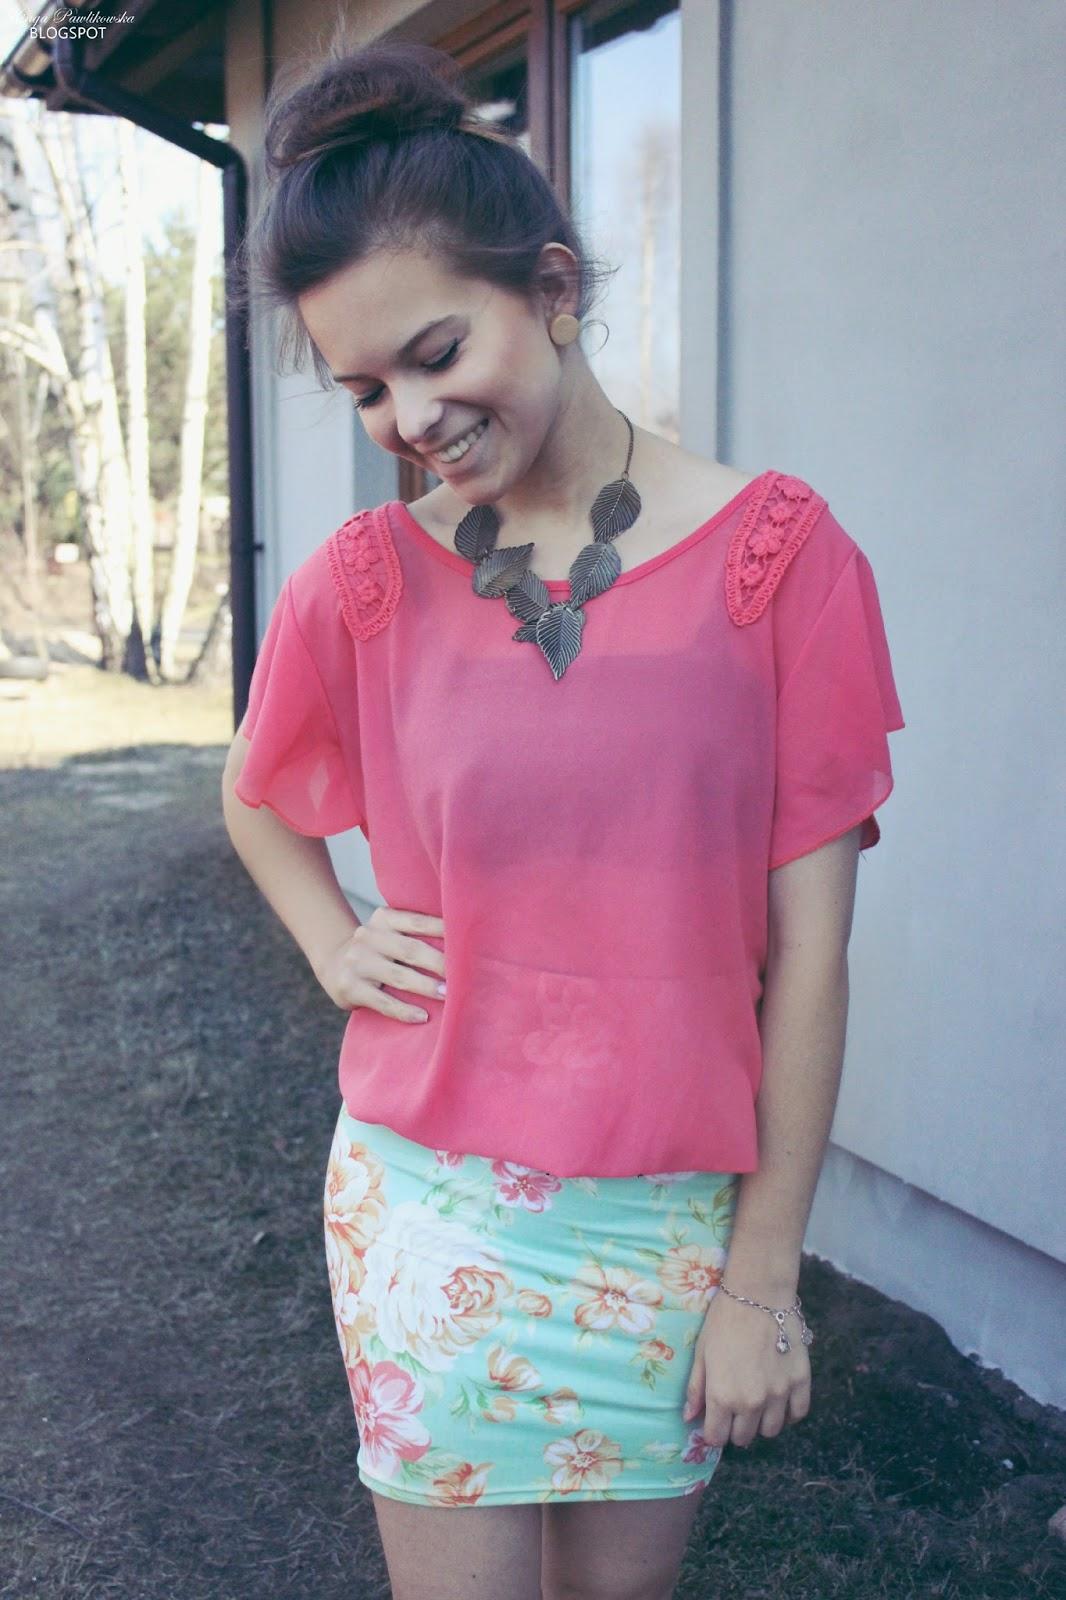 ❀ Floral skirt!